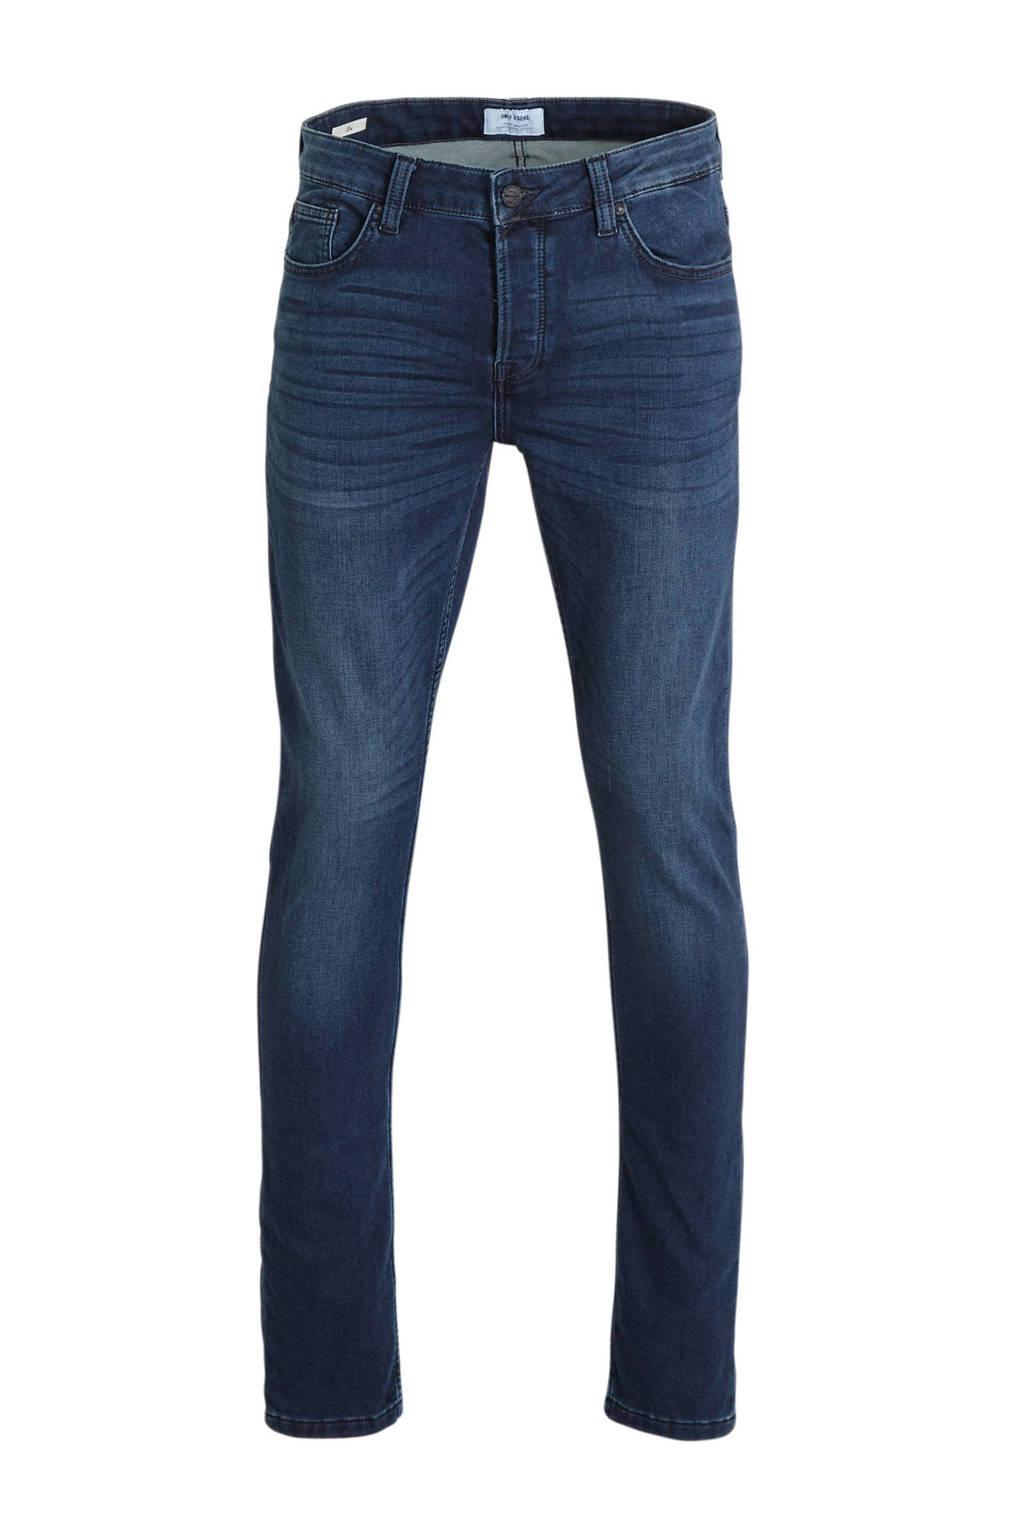 ONLY & SONS Loom slim fit jeans, Blue Denim 0431